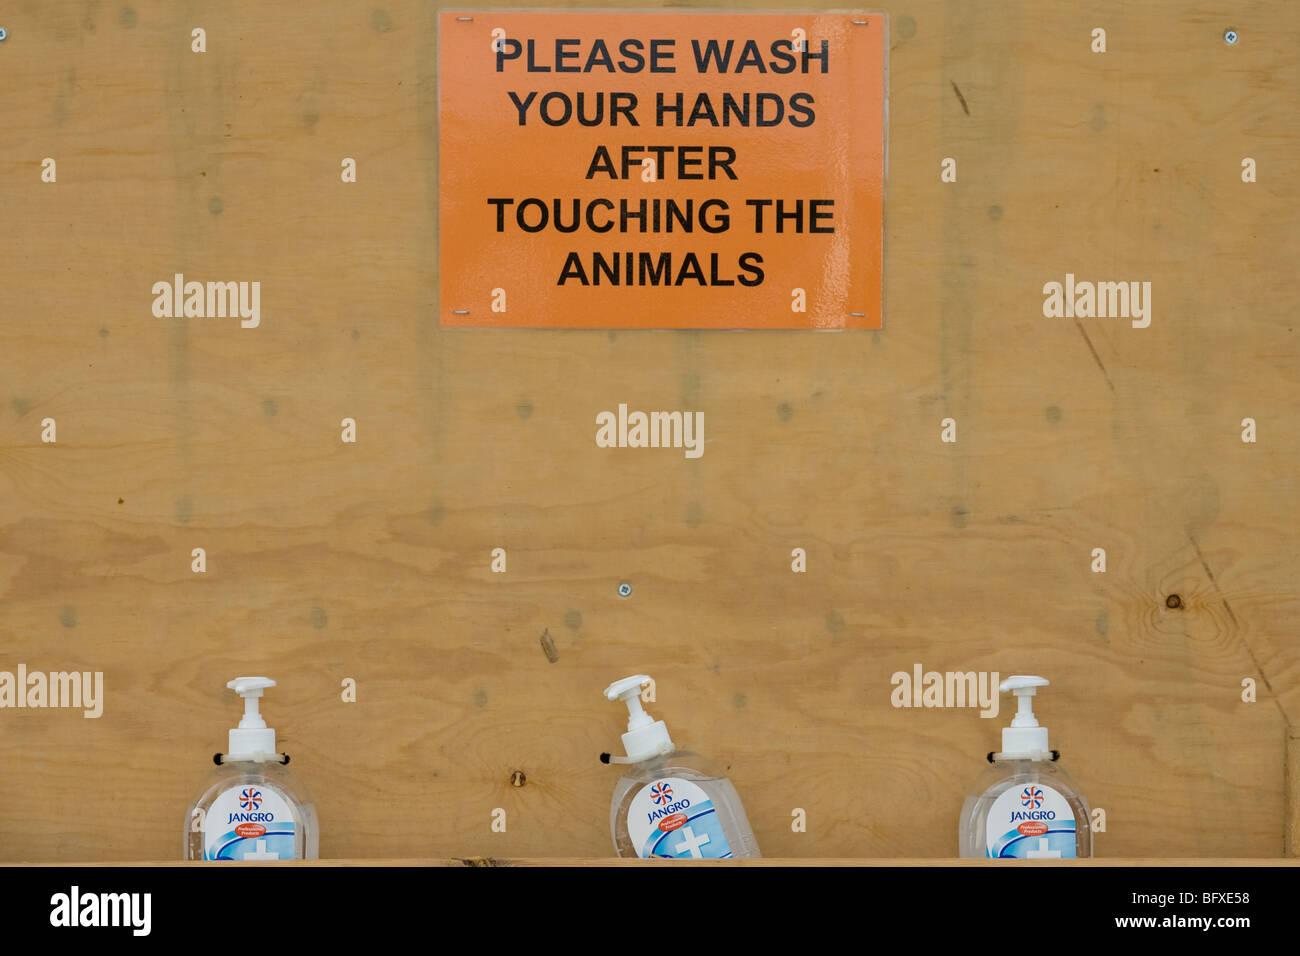 Hand Wash At A Petting Farm - Stock Image